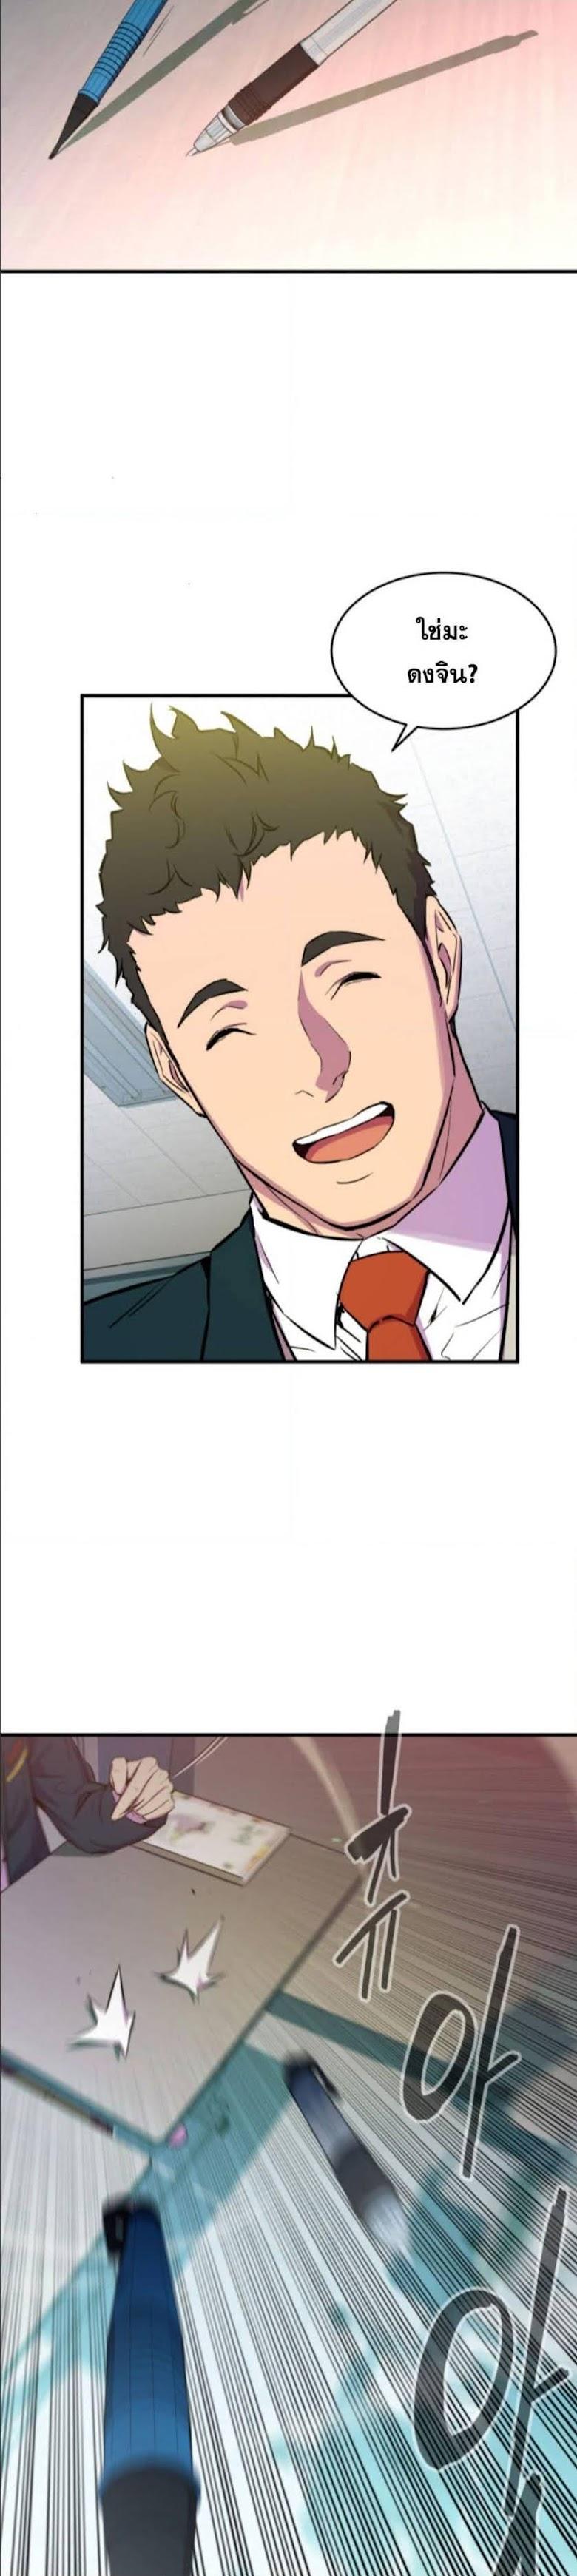 Incompetent Villain - หน้า 14